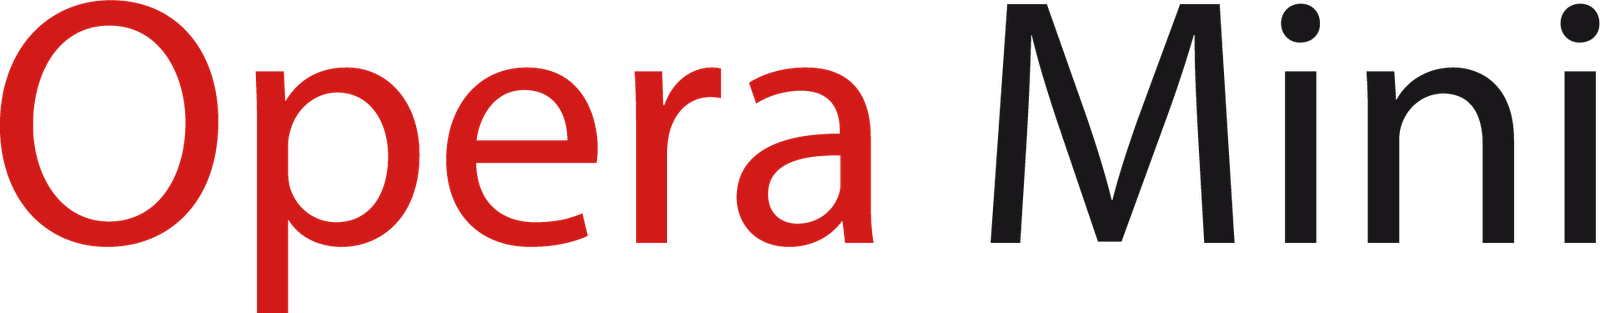 Opera_Mini_logo.png